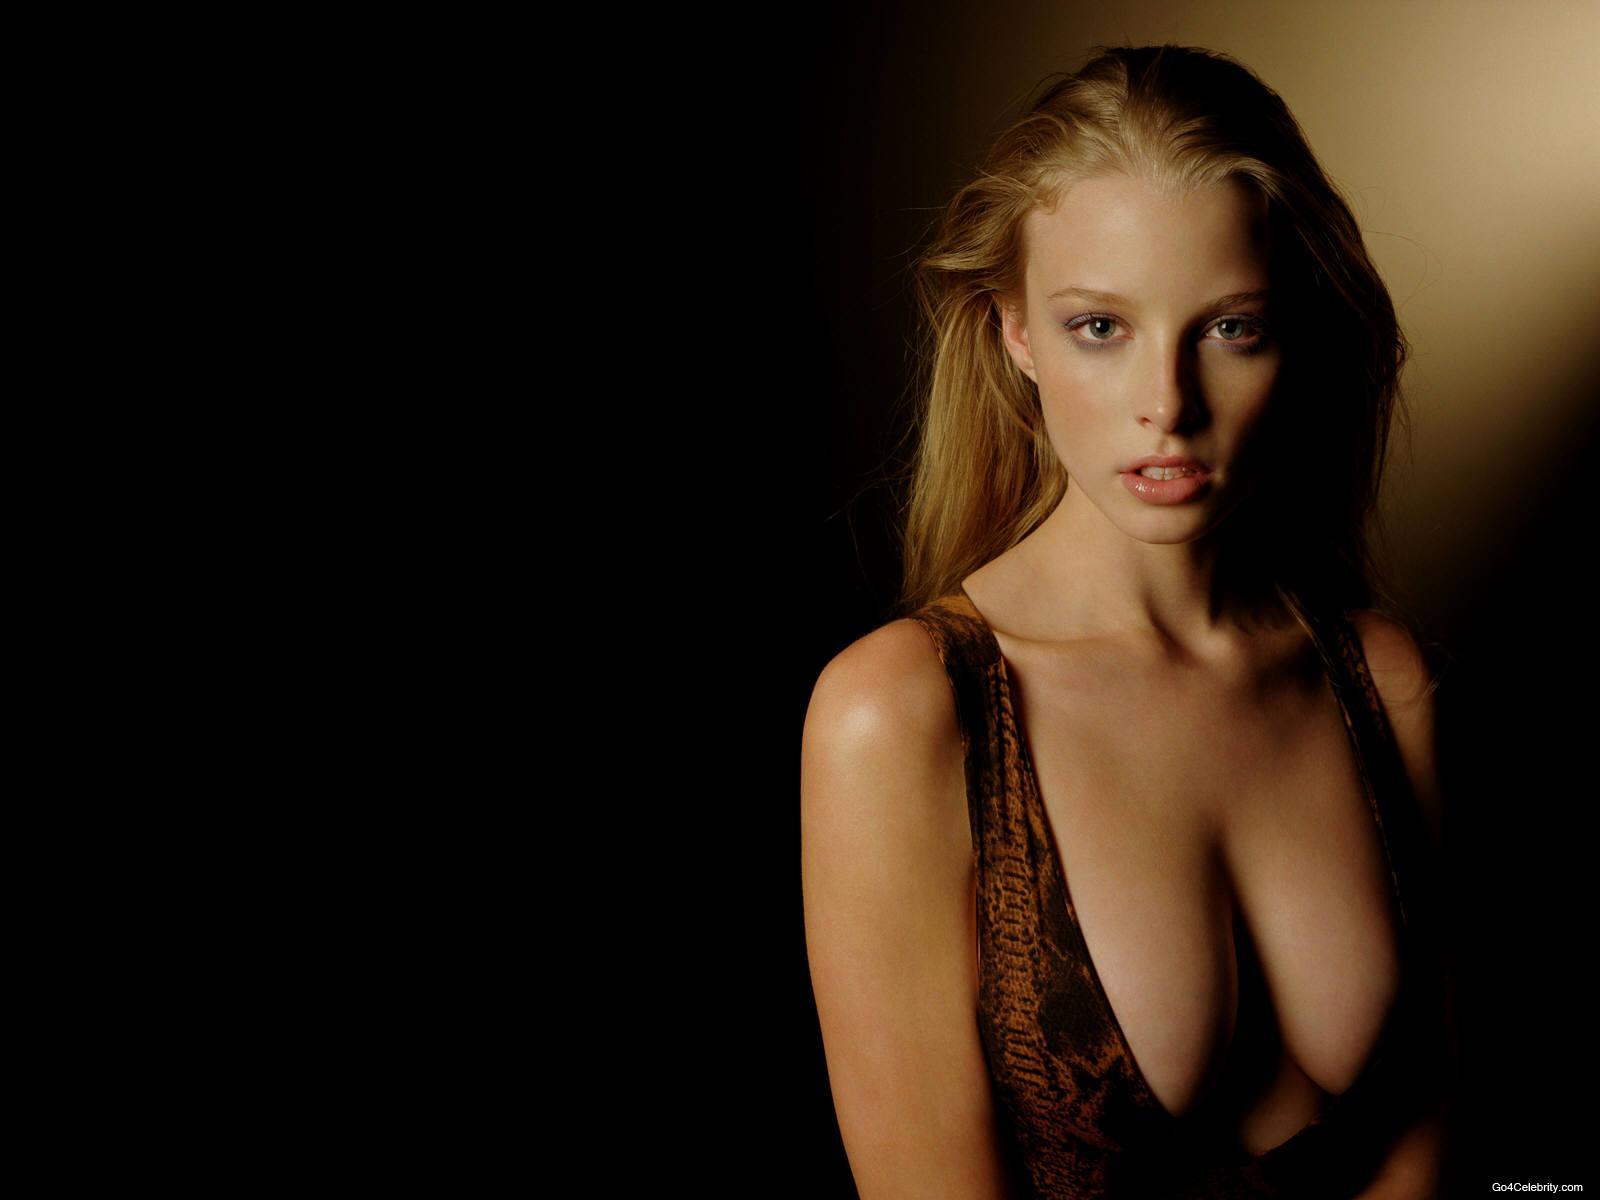 Stunning Rachel Nichols Hot Body Pics 2012 - Currentblips Snap